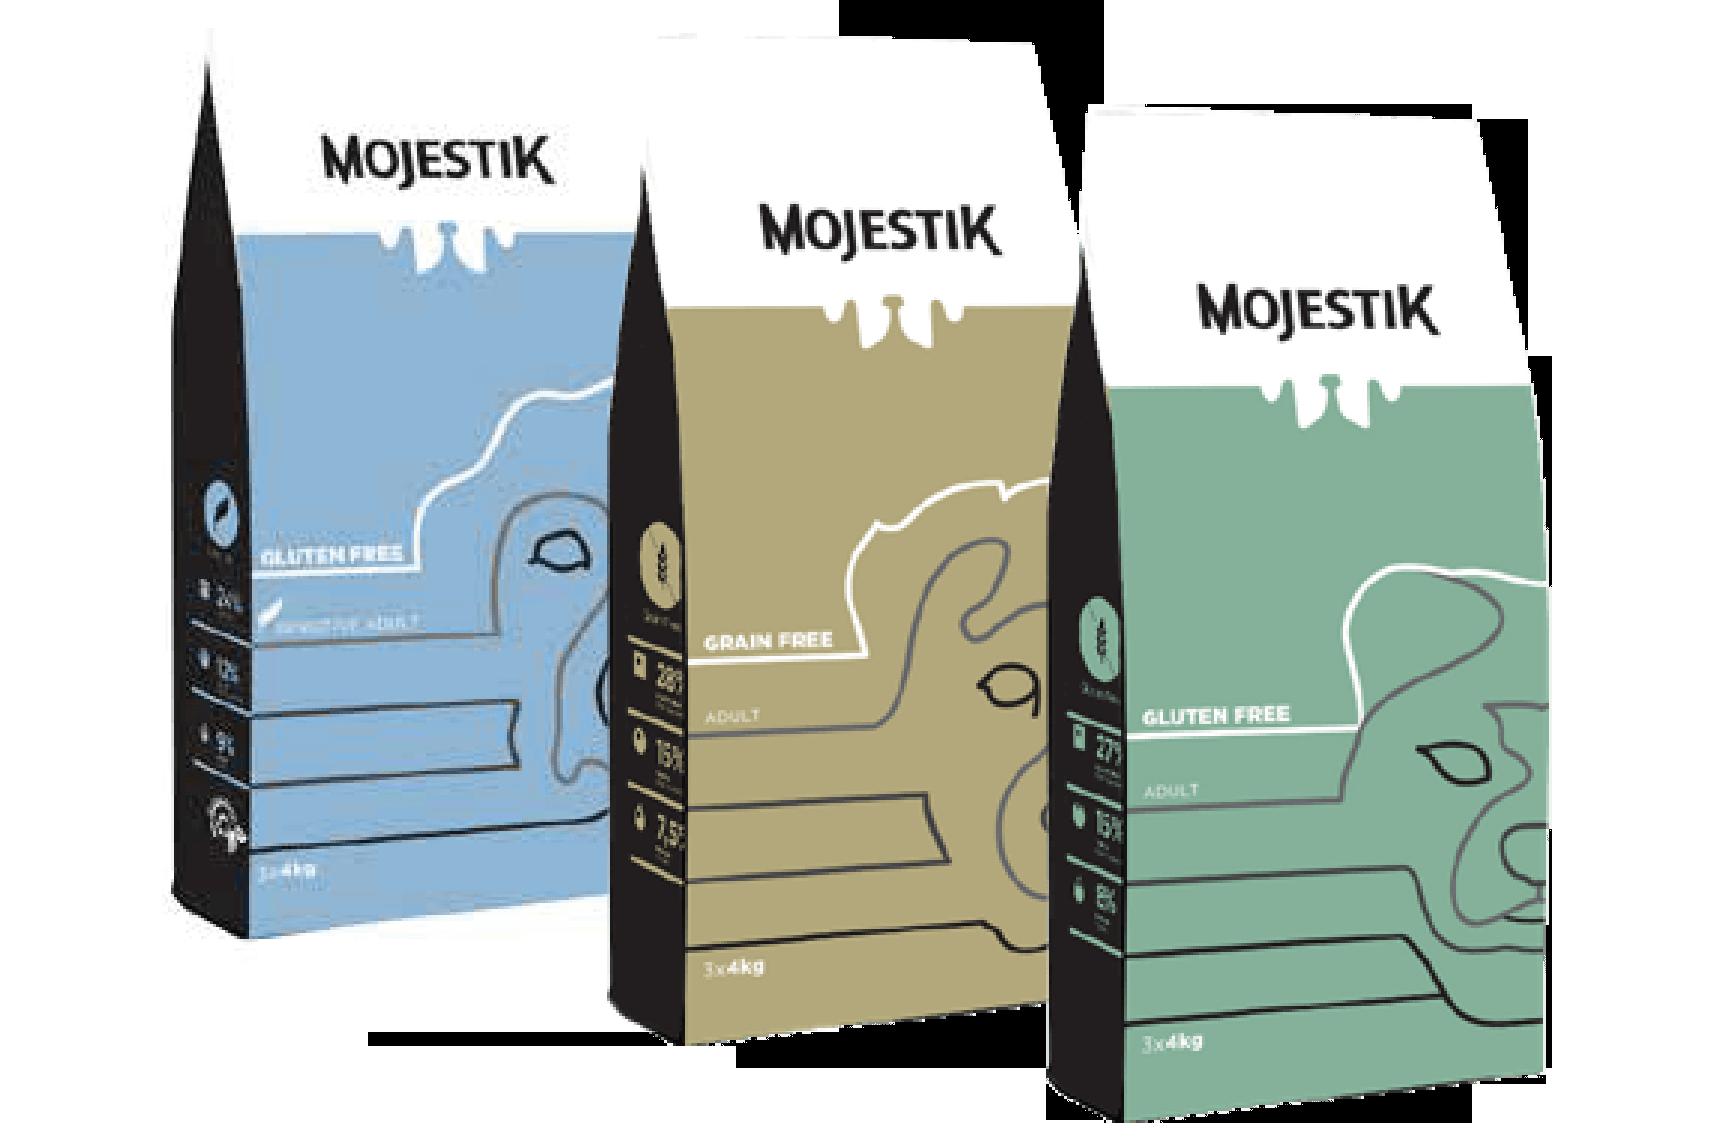 Mojestik first bags